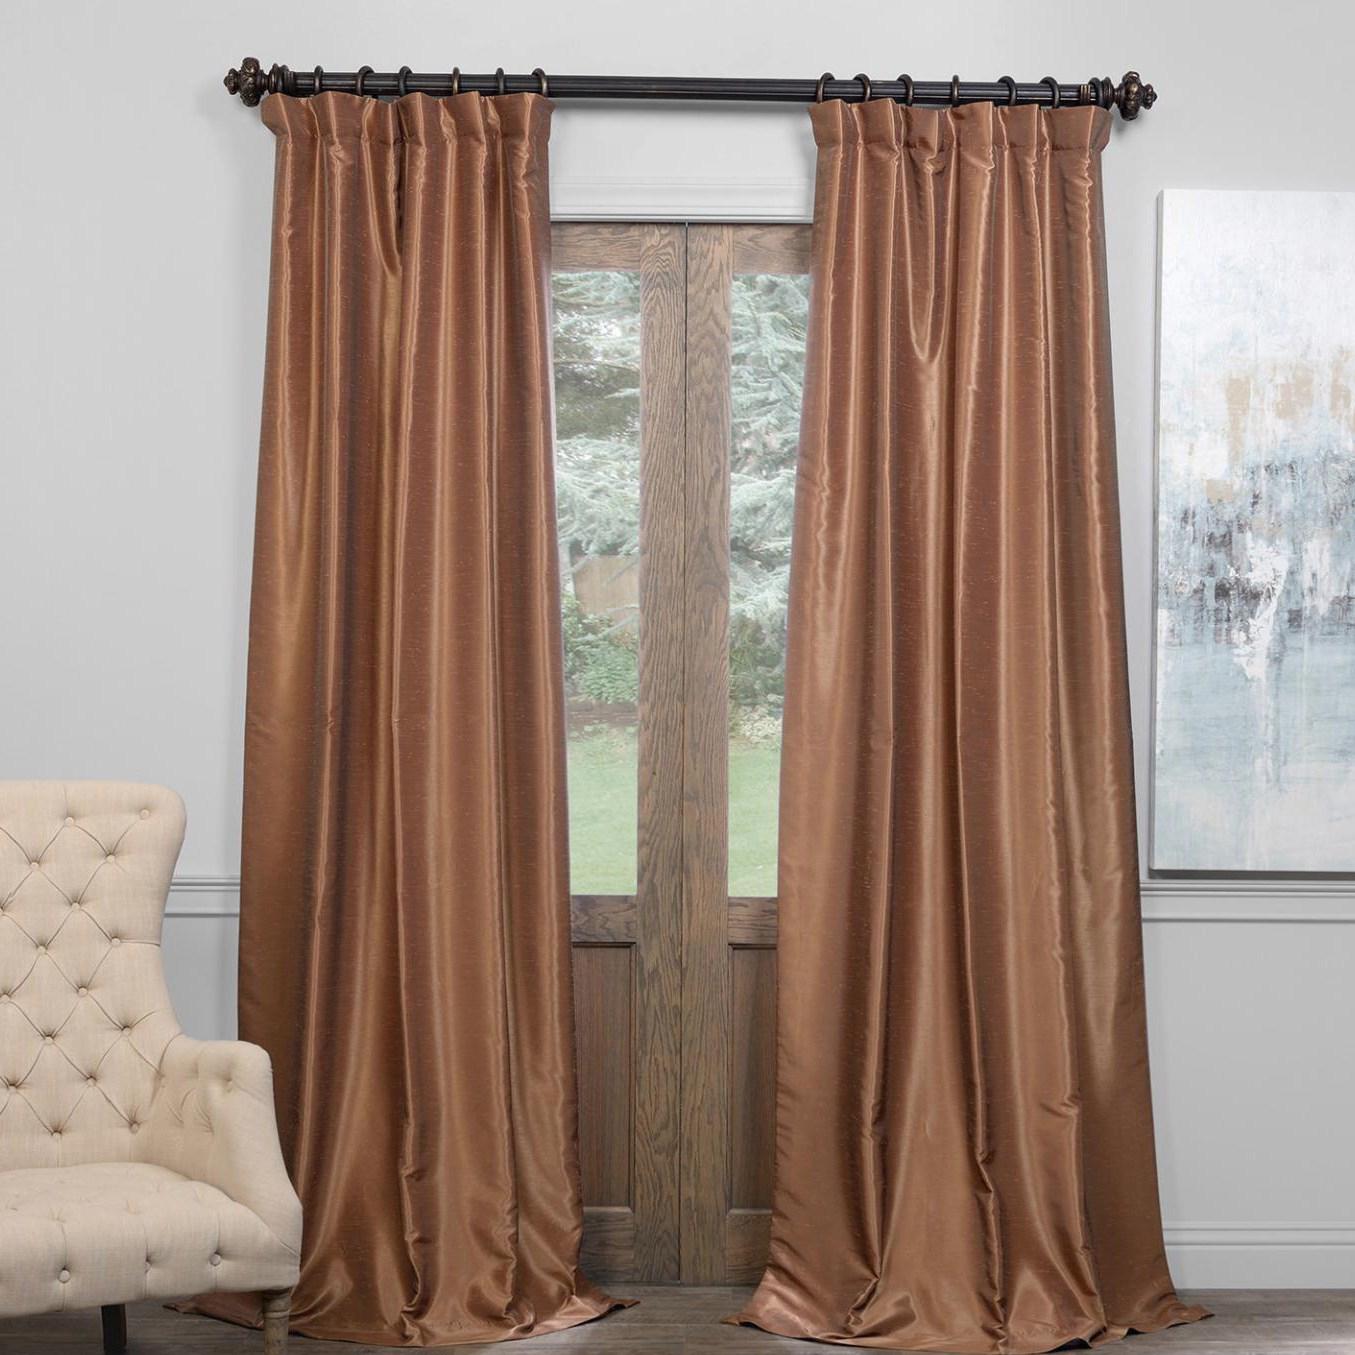 Exclusive Fabrics True Blackout Vintage Textured Faux Dupioni Silk Curtain Panel Inside Silver Vintage Faux Textured Silk Curtain Panels (View 21 of 30)